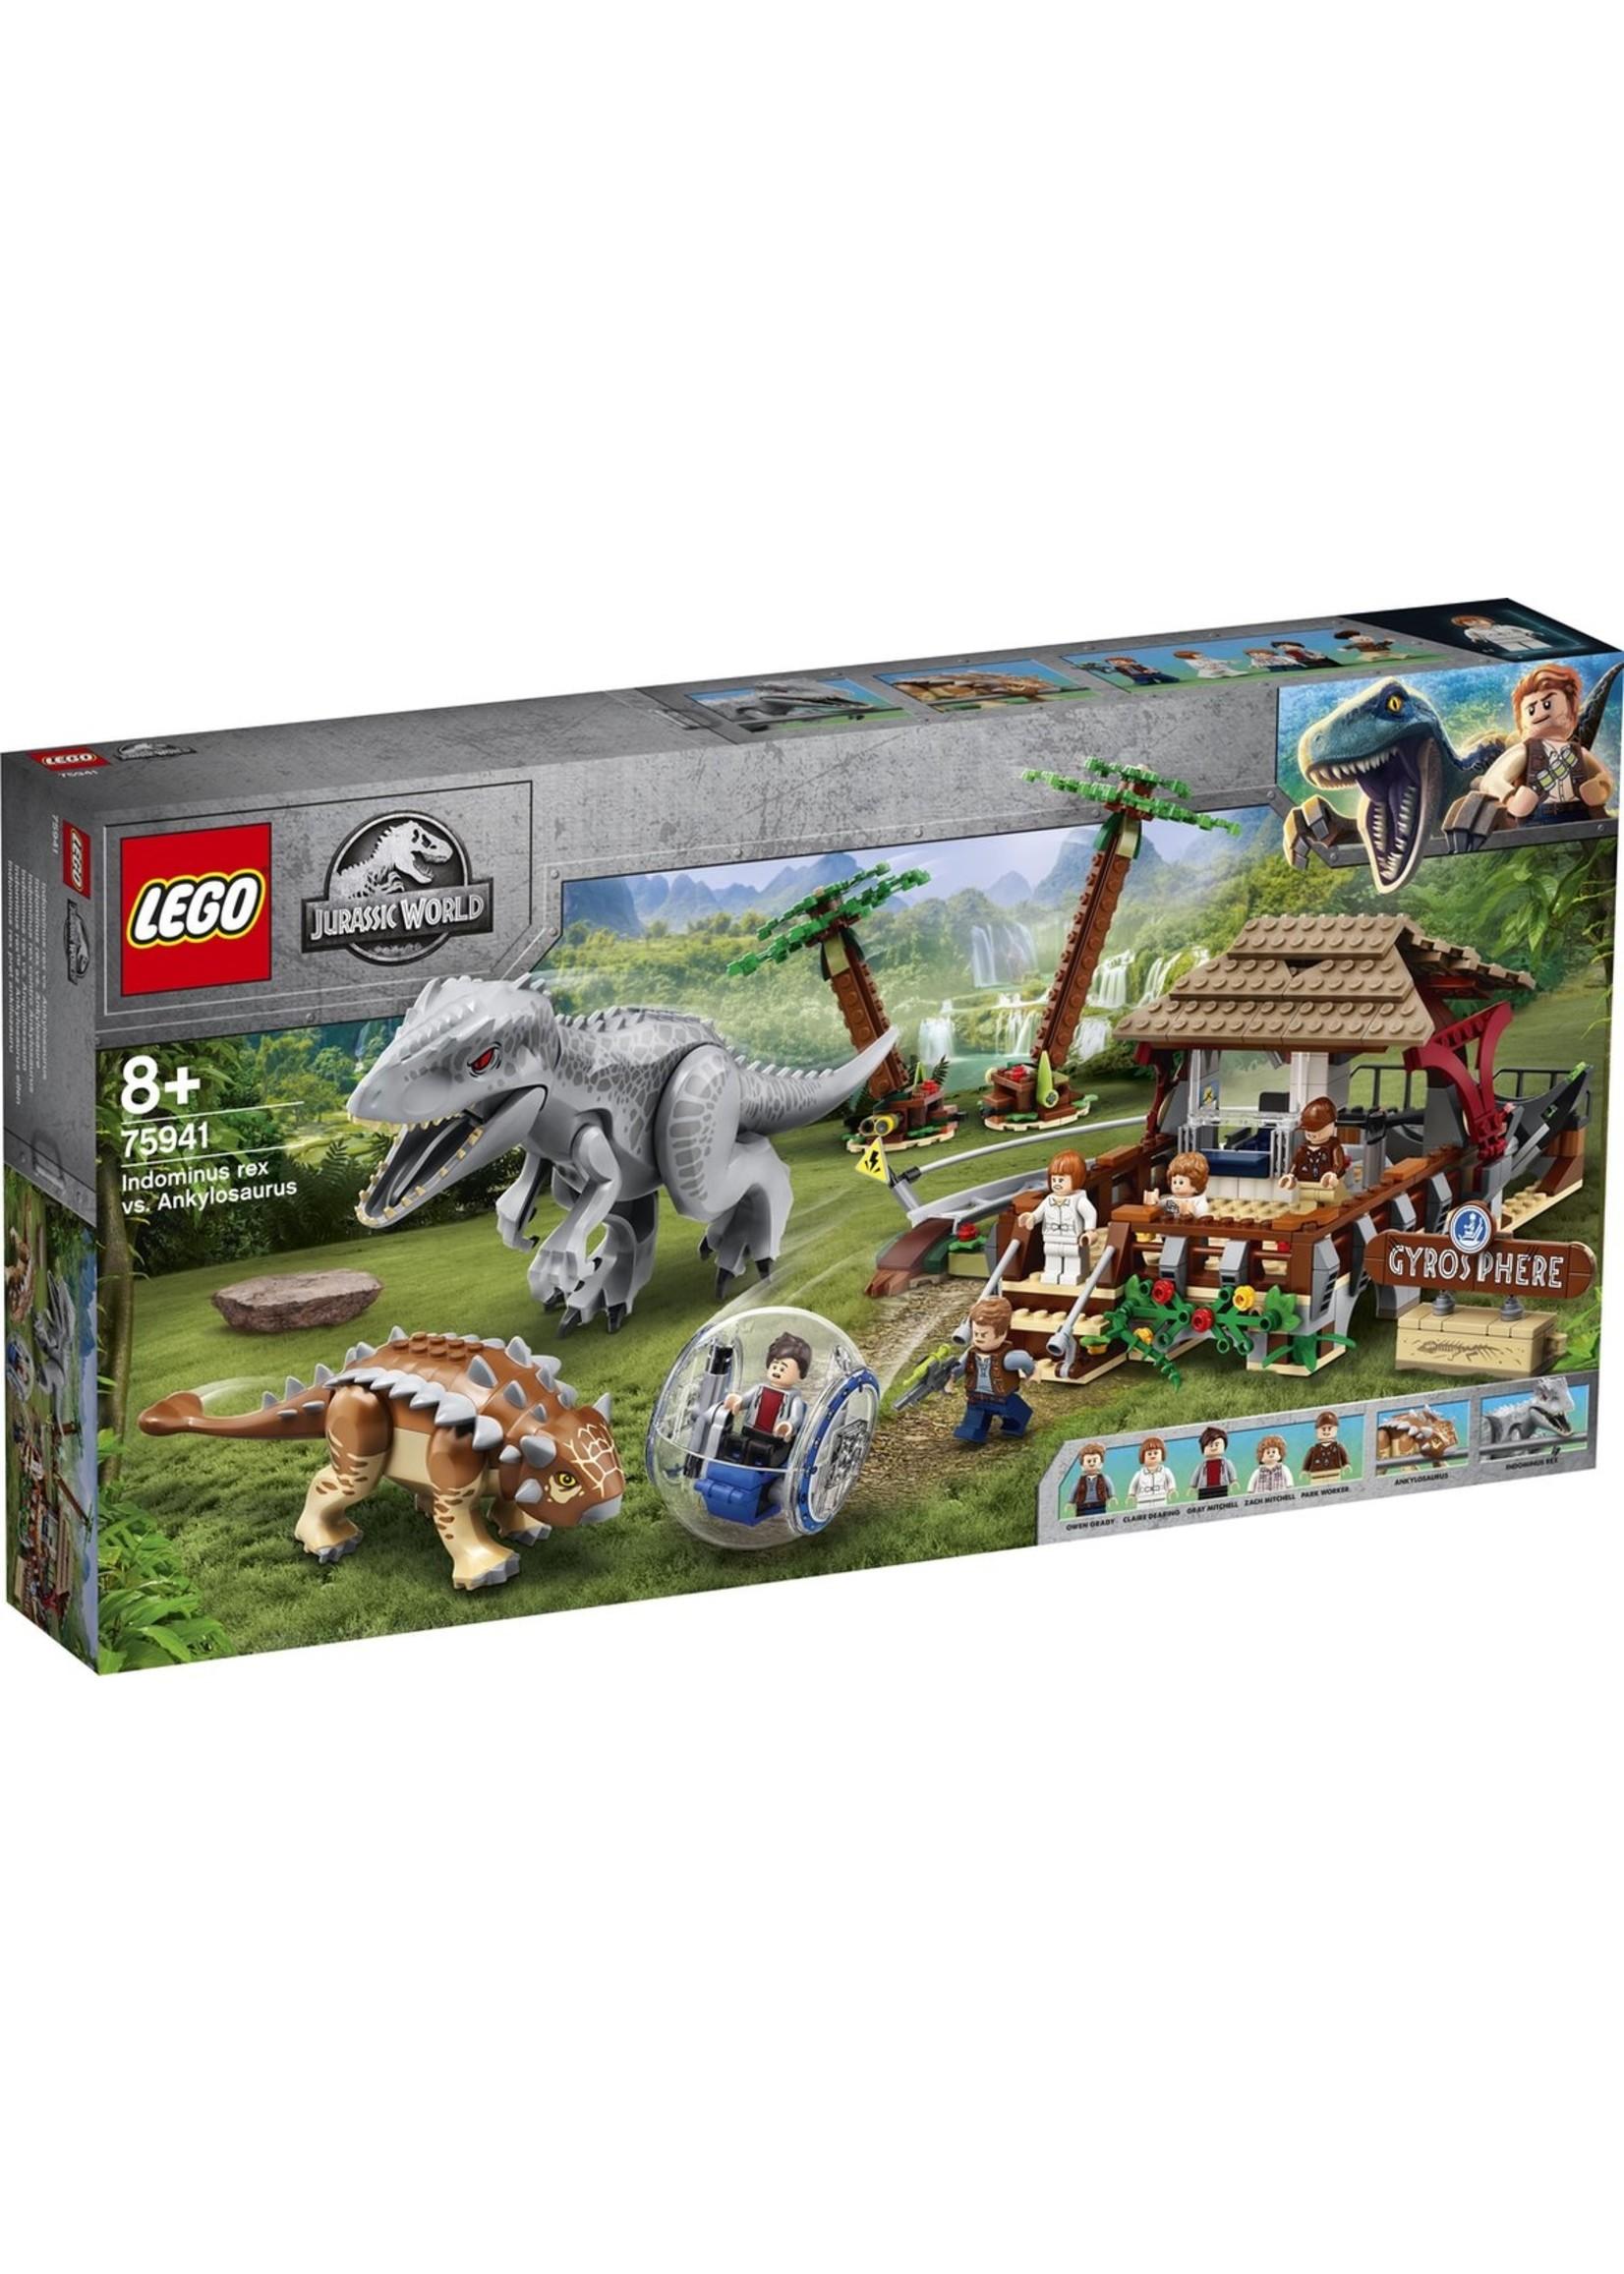 Lego LEGO Jurassic Park Indominus Rex vs. Ankylosaurus -75941 koopjeshoek